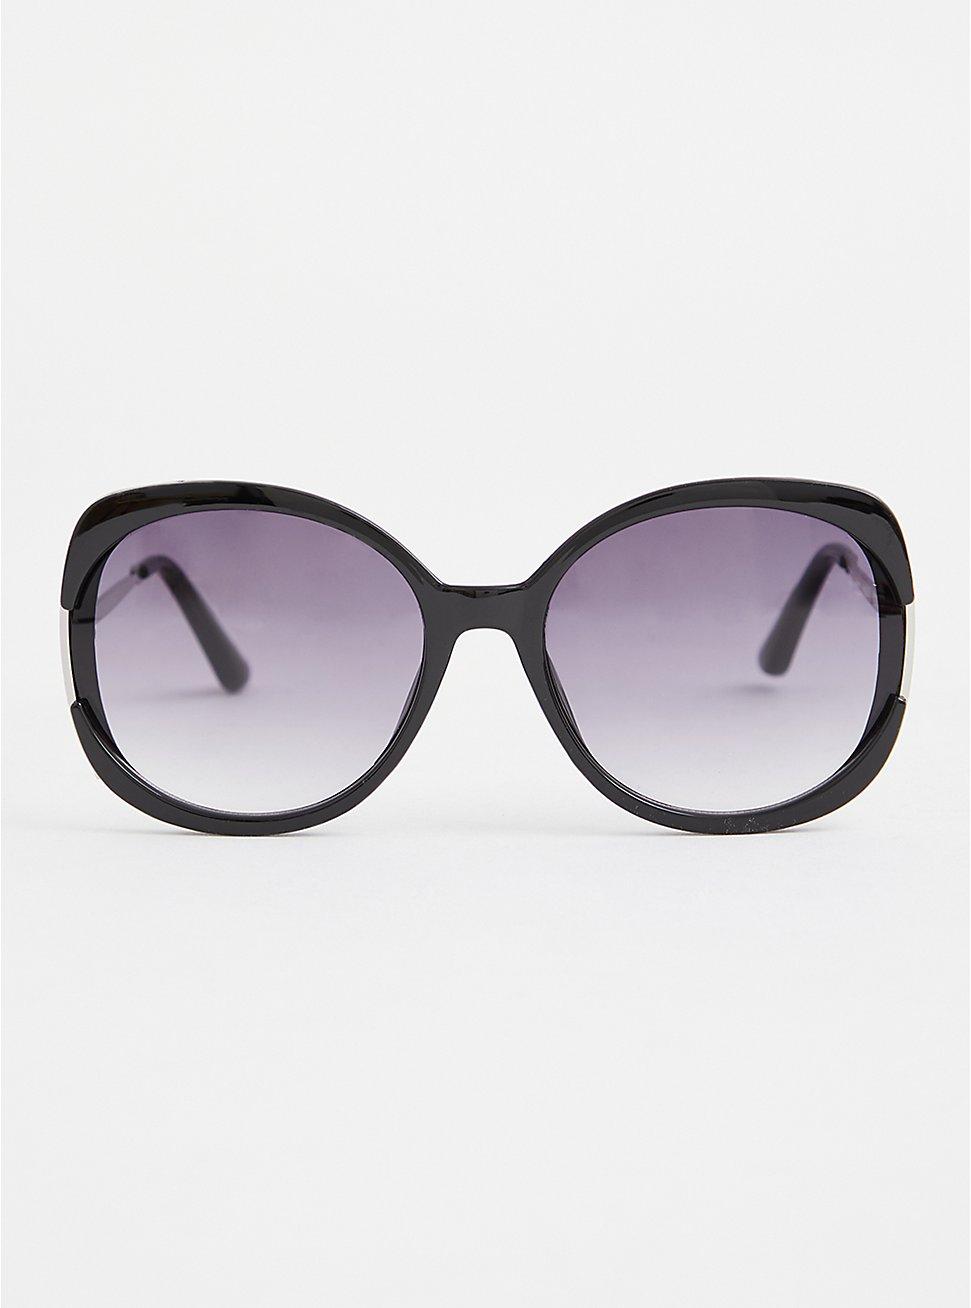 Black Oversized Square Sunglasses, , hi-res